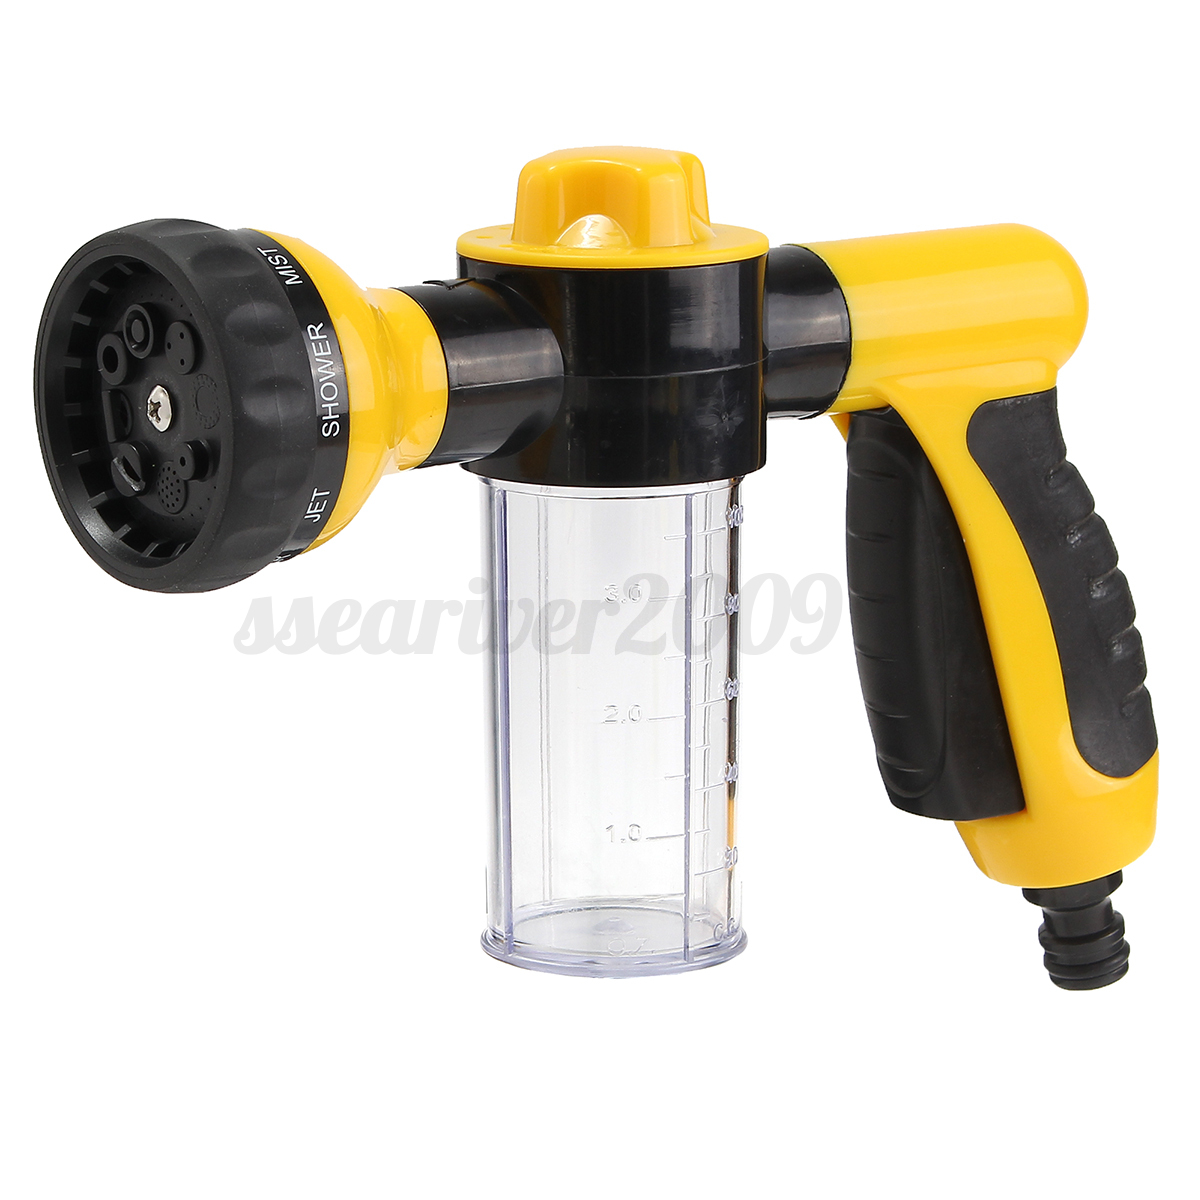 In jet nozzle spray head gun soap dispenser garden